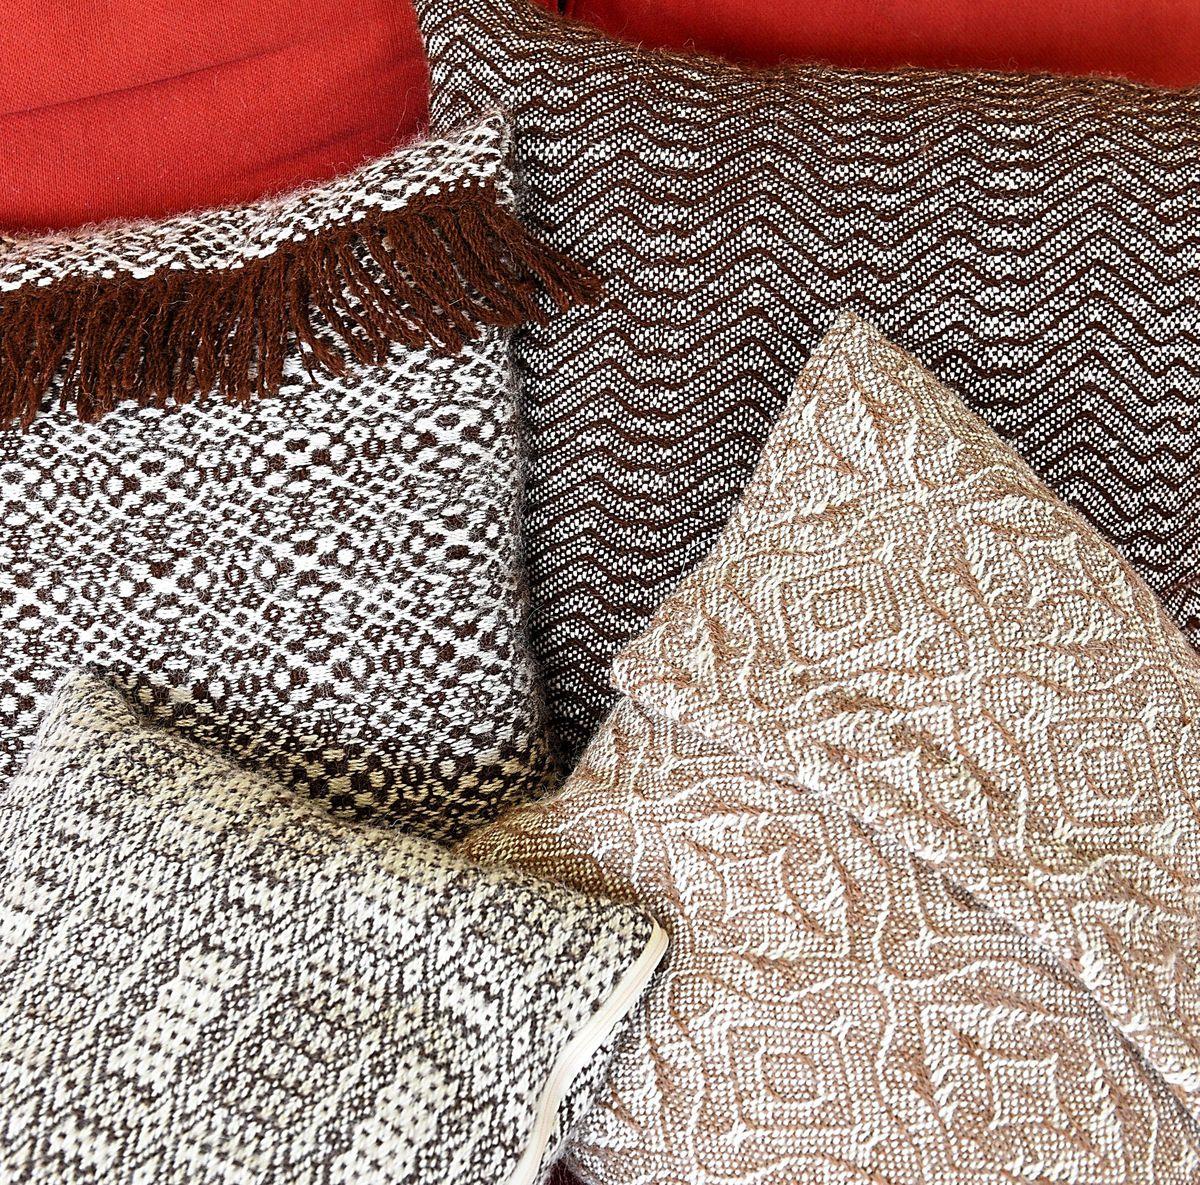 Nice weave – some of the alpaca wool fabrics